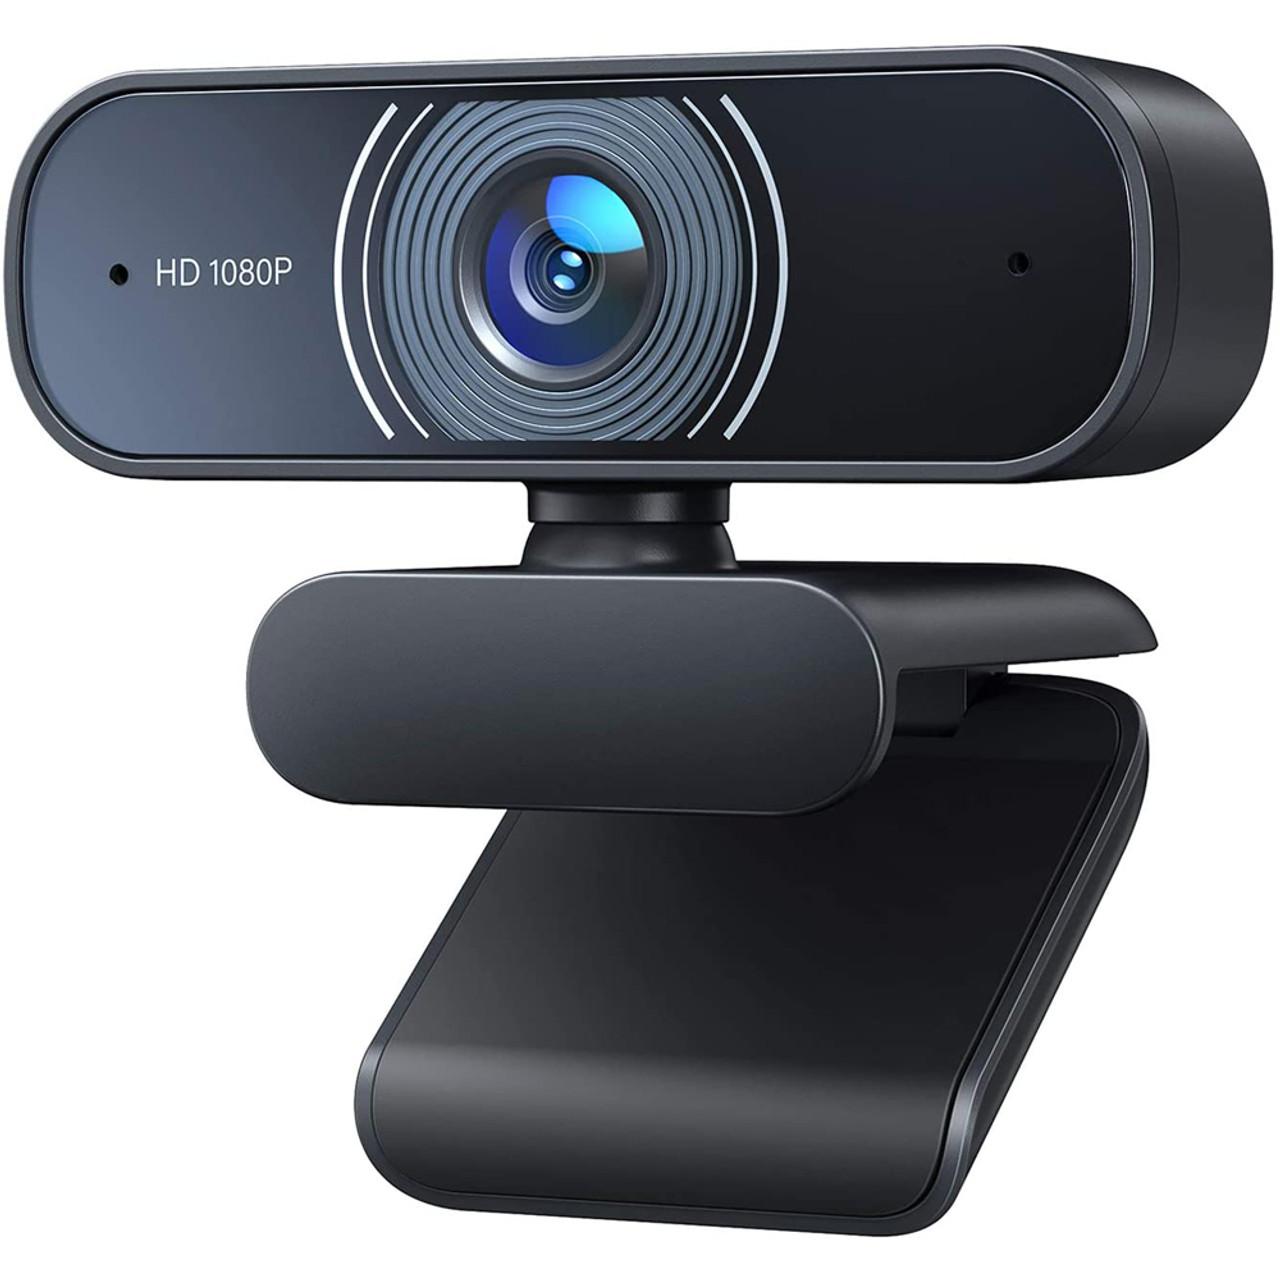 Relano Dual Microphone 1080p Webcam $13.99 (80% OFF)